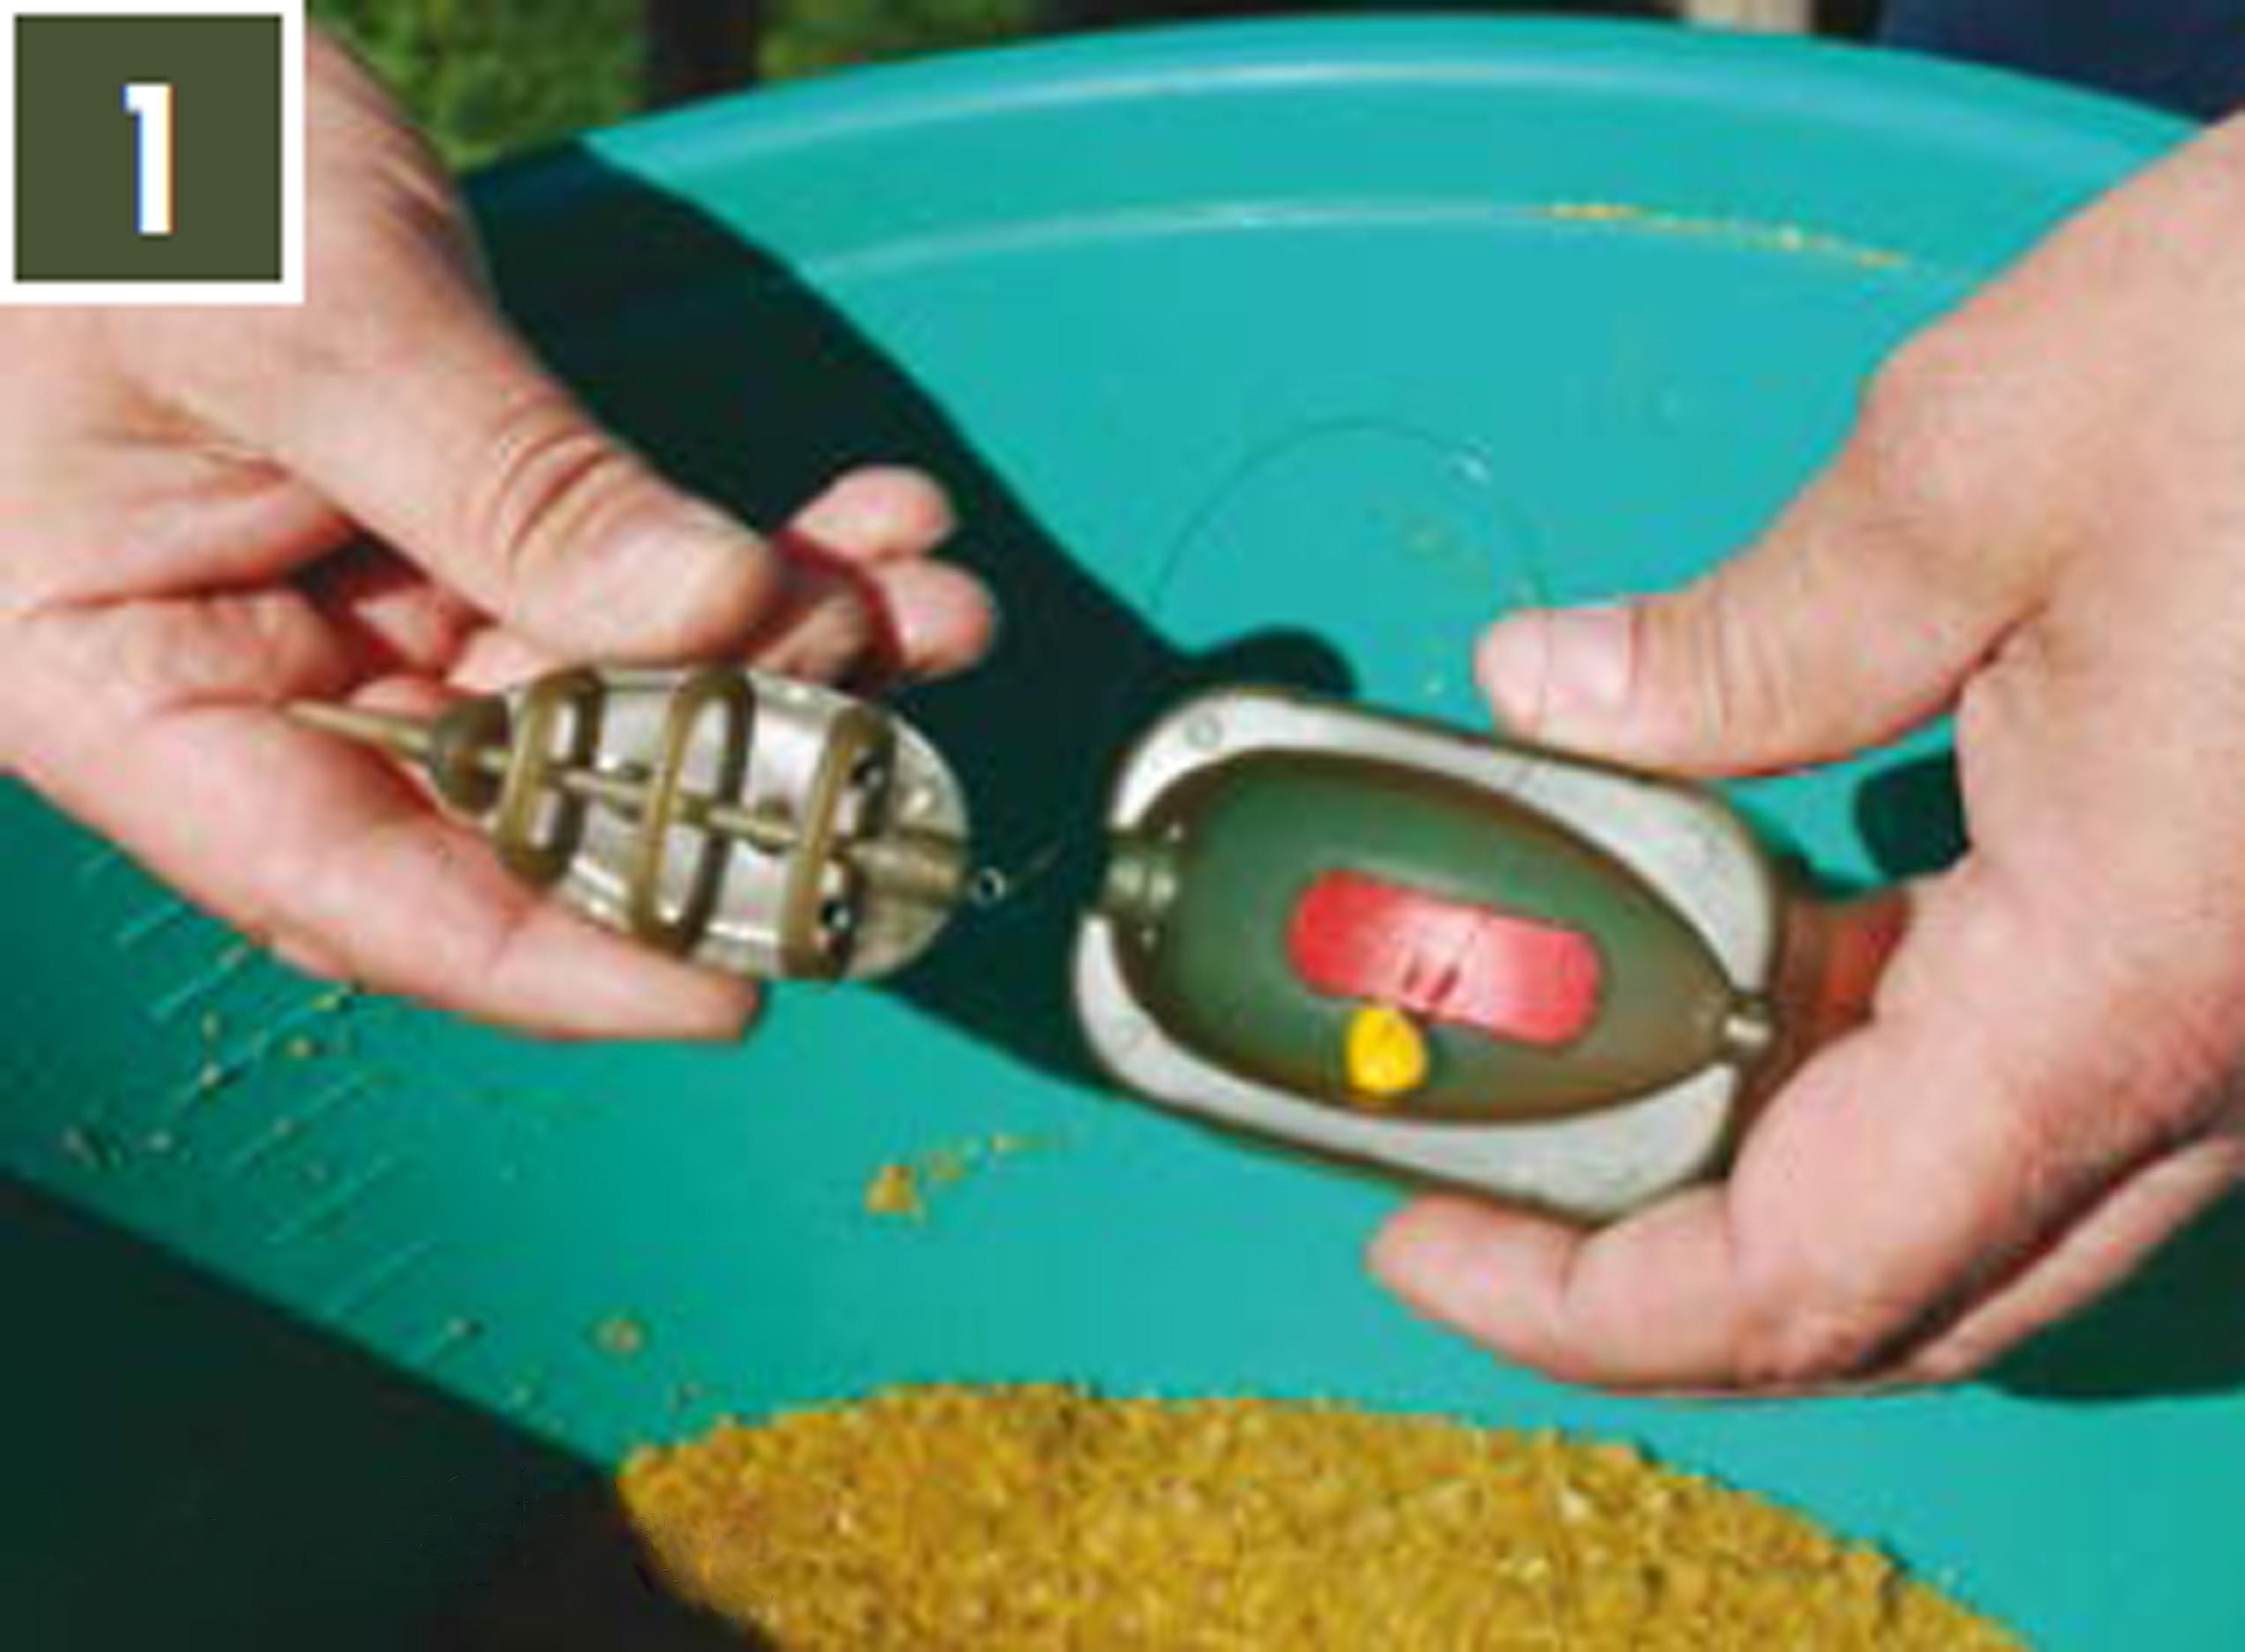 Behr Fishing Method Feeder Set 50-60g Futterkörbe Ausdrückform